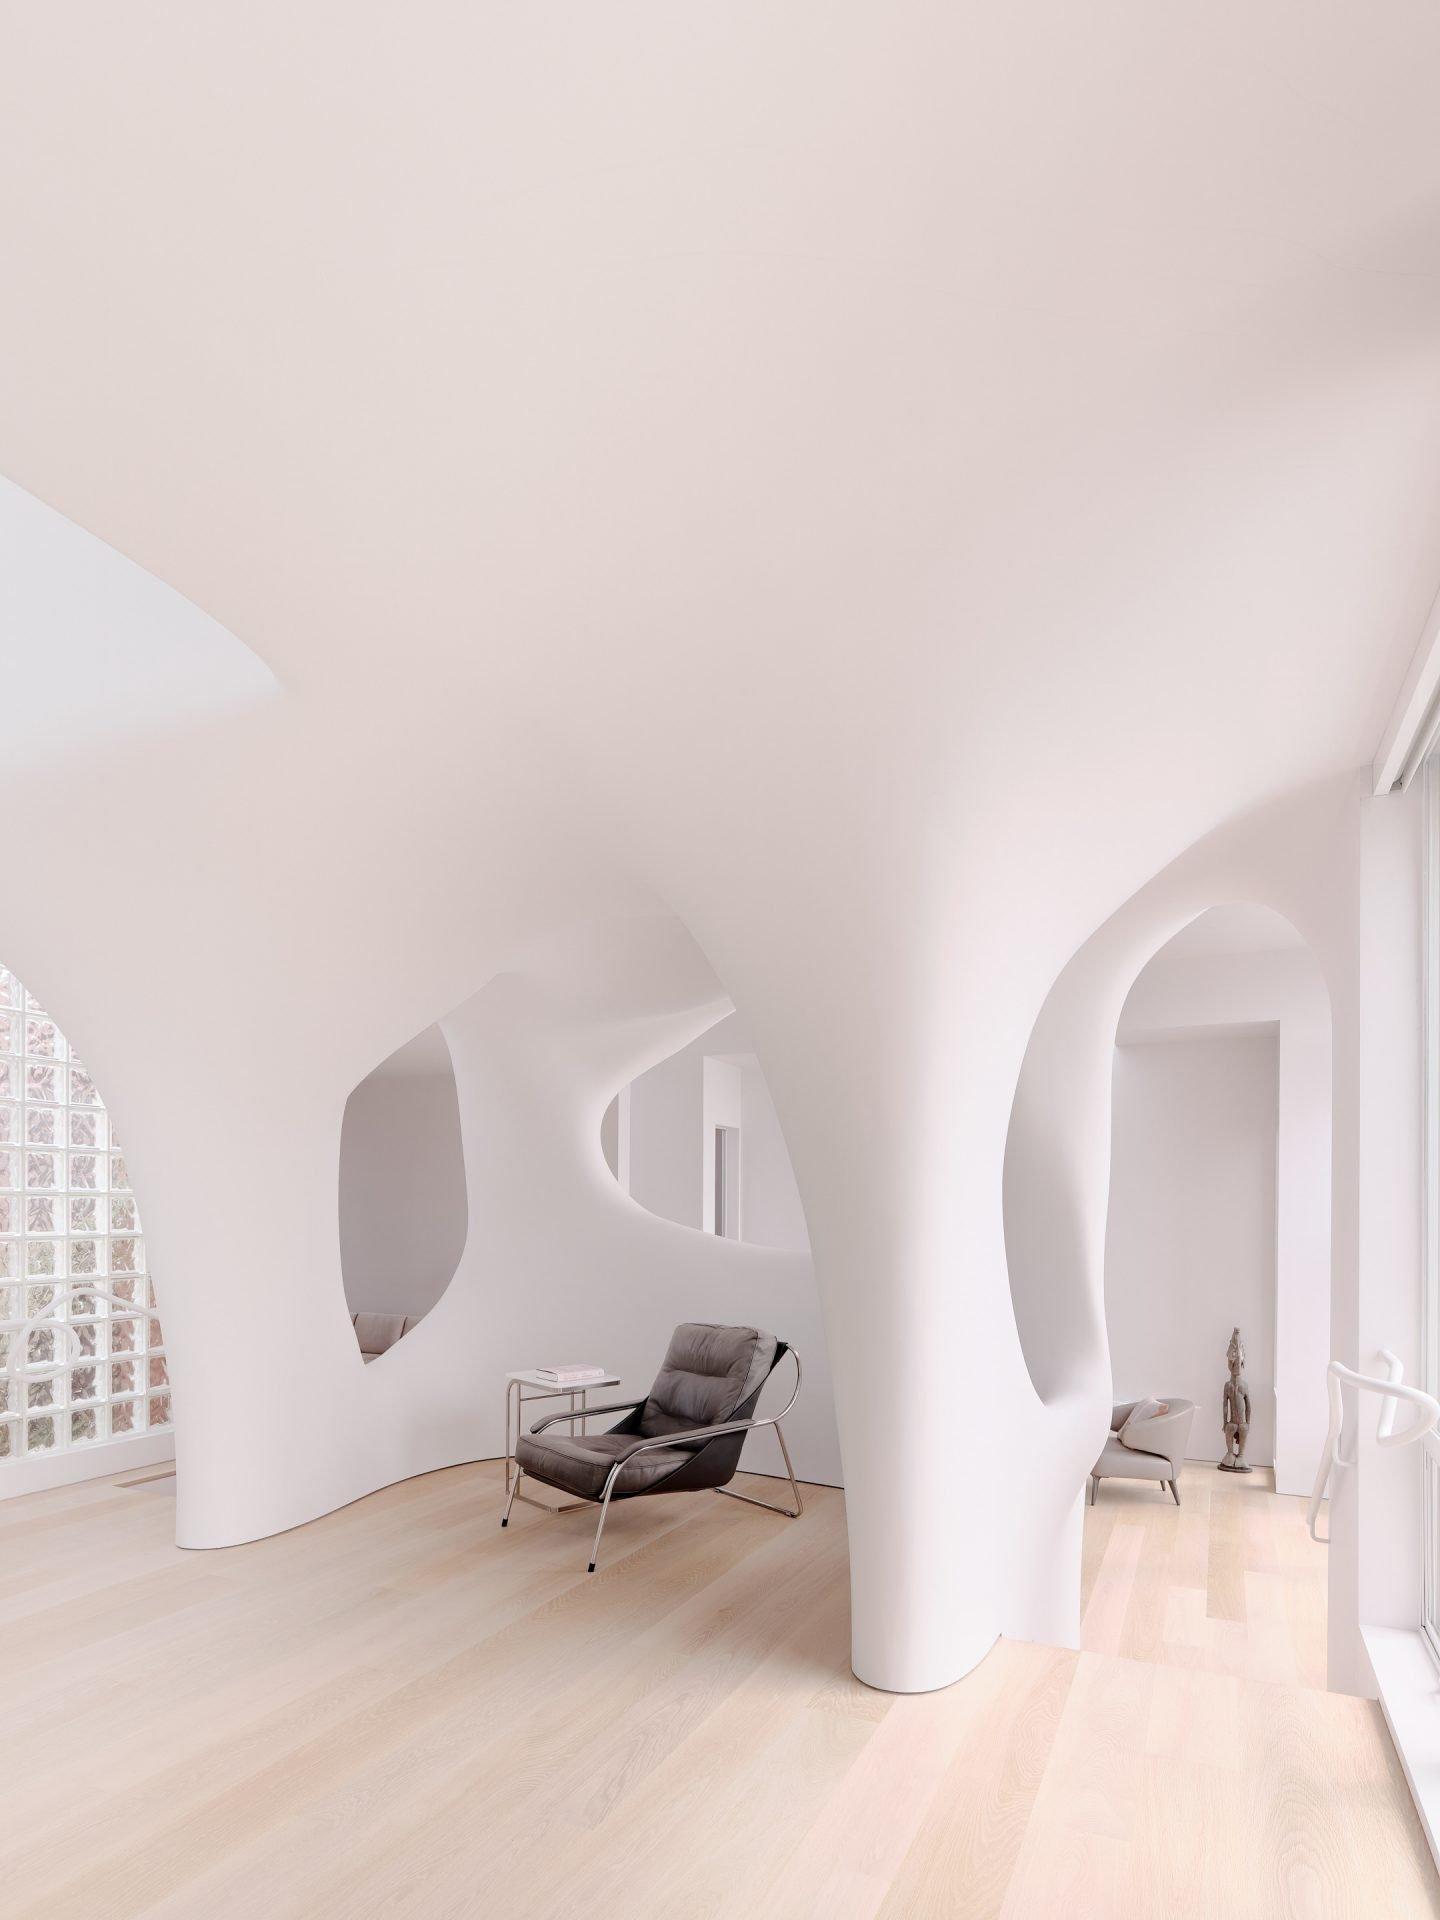 IGNANT-Architecture-Opa-Softie-03